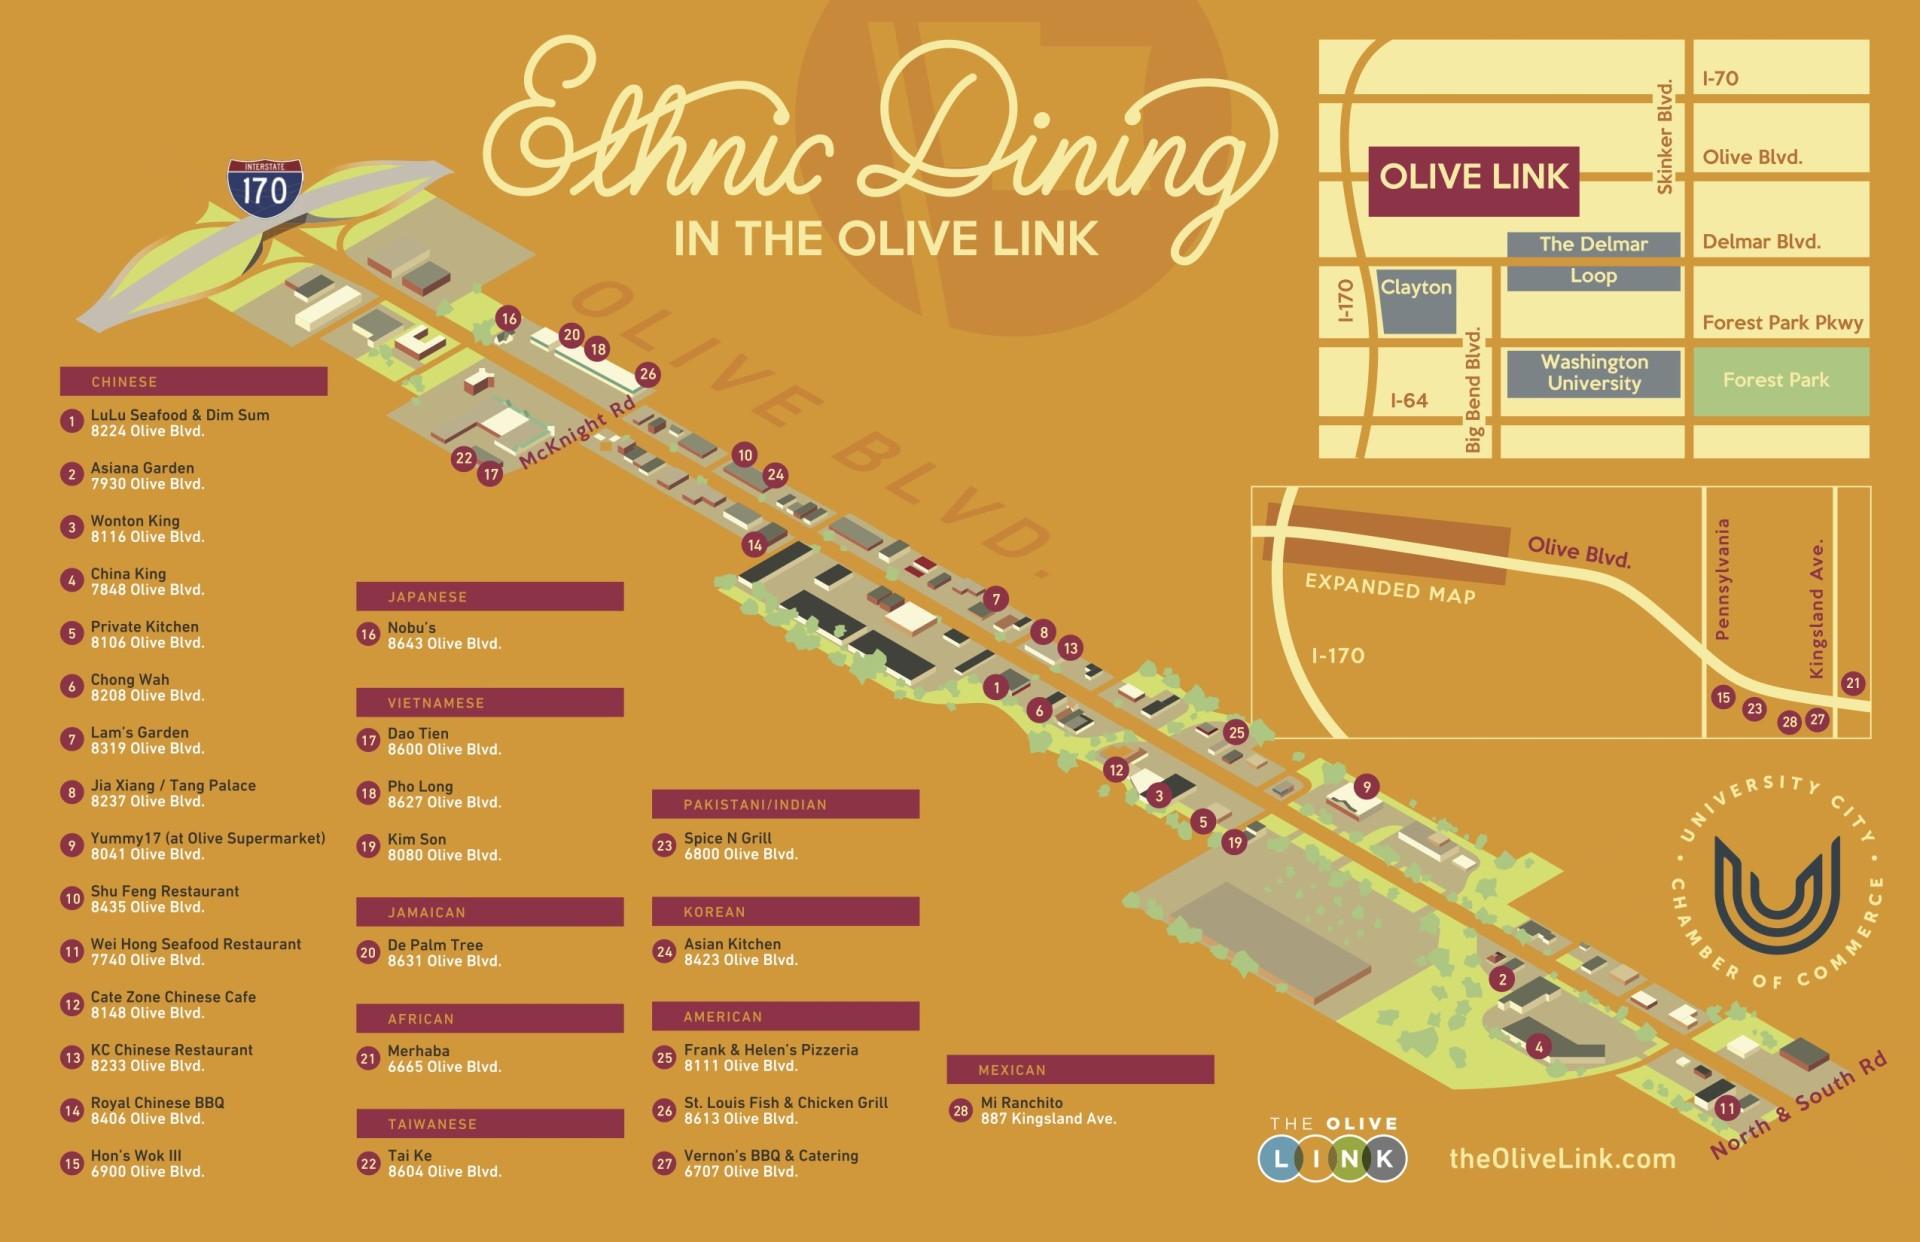 Ethnic-Dining-Guide.jpg